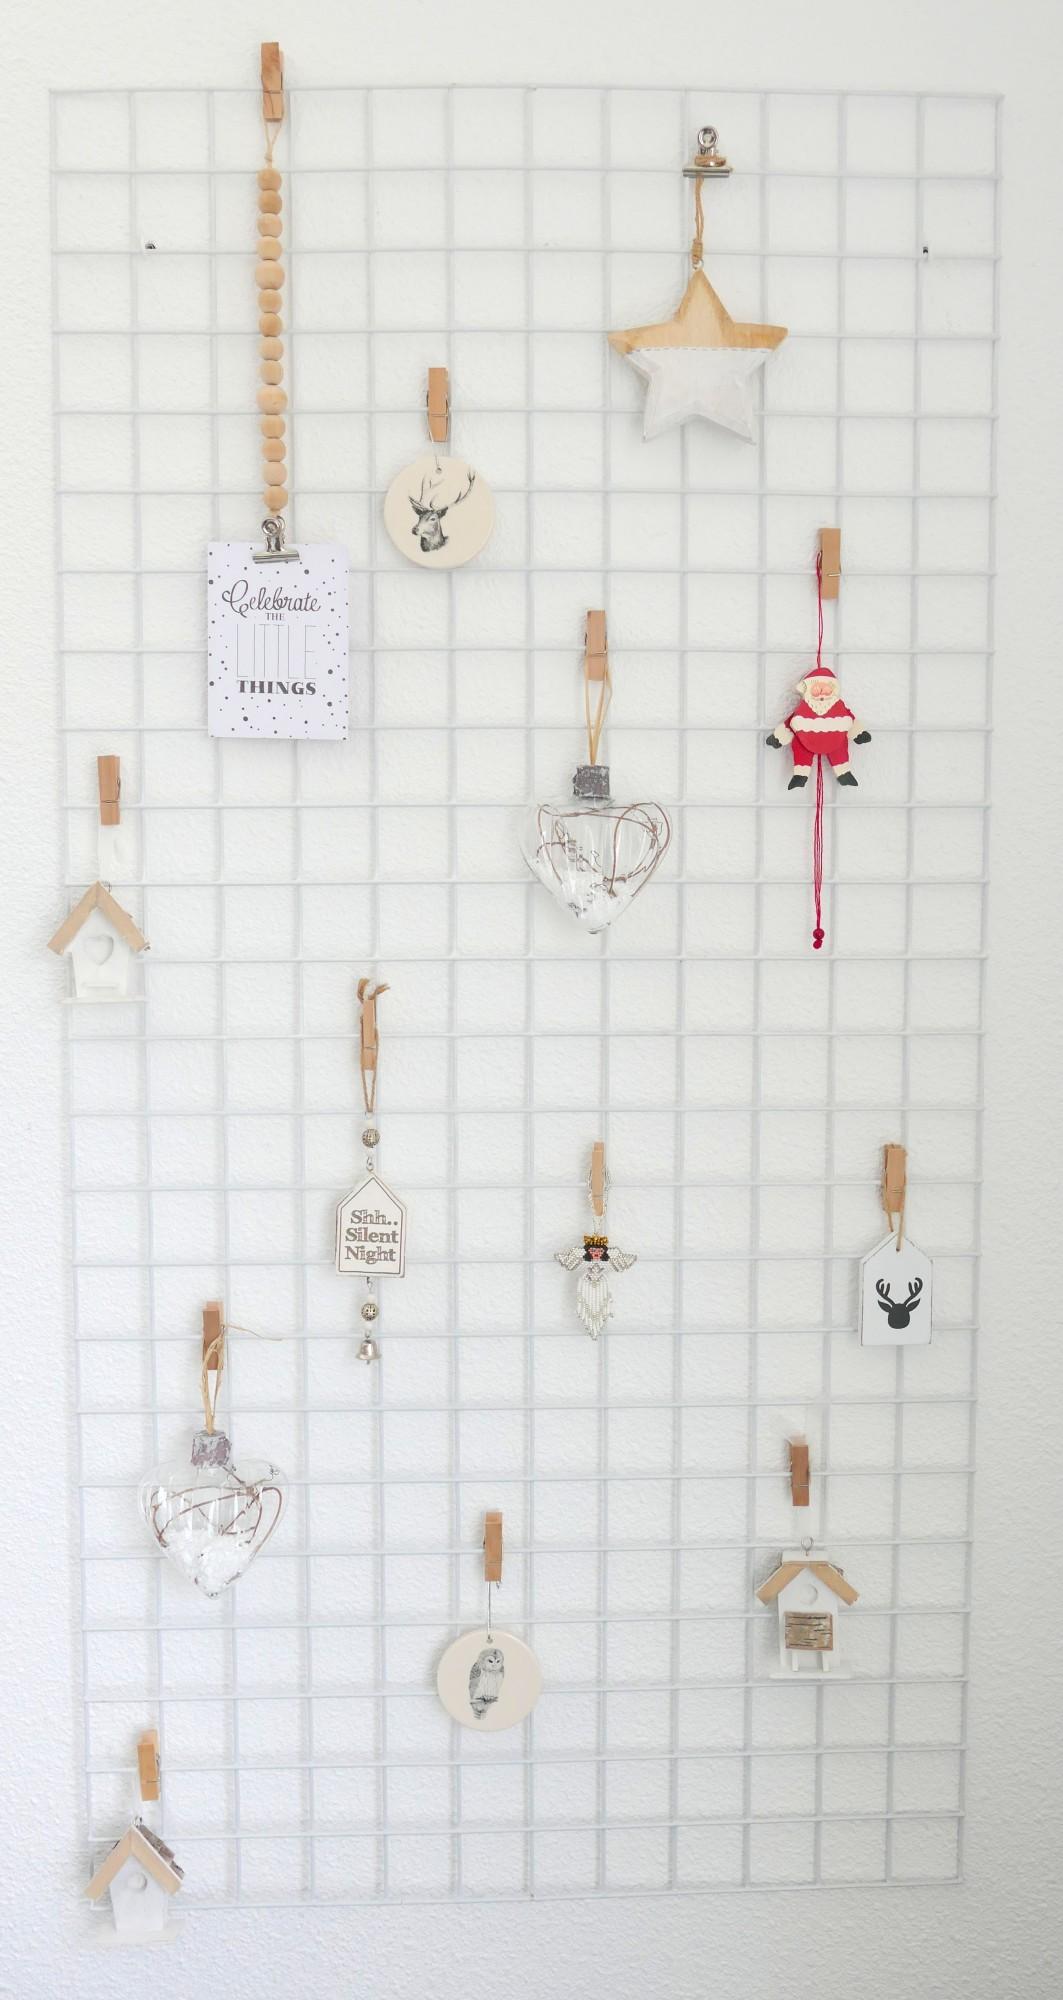 DIY wandrek + kerst/winter decoraties - Sillysis